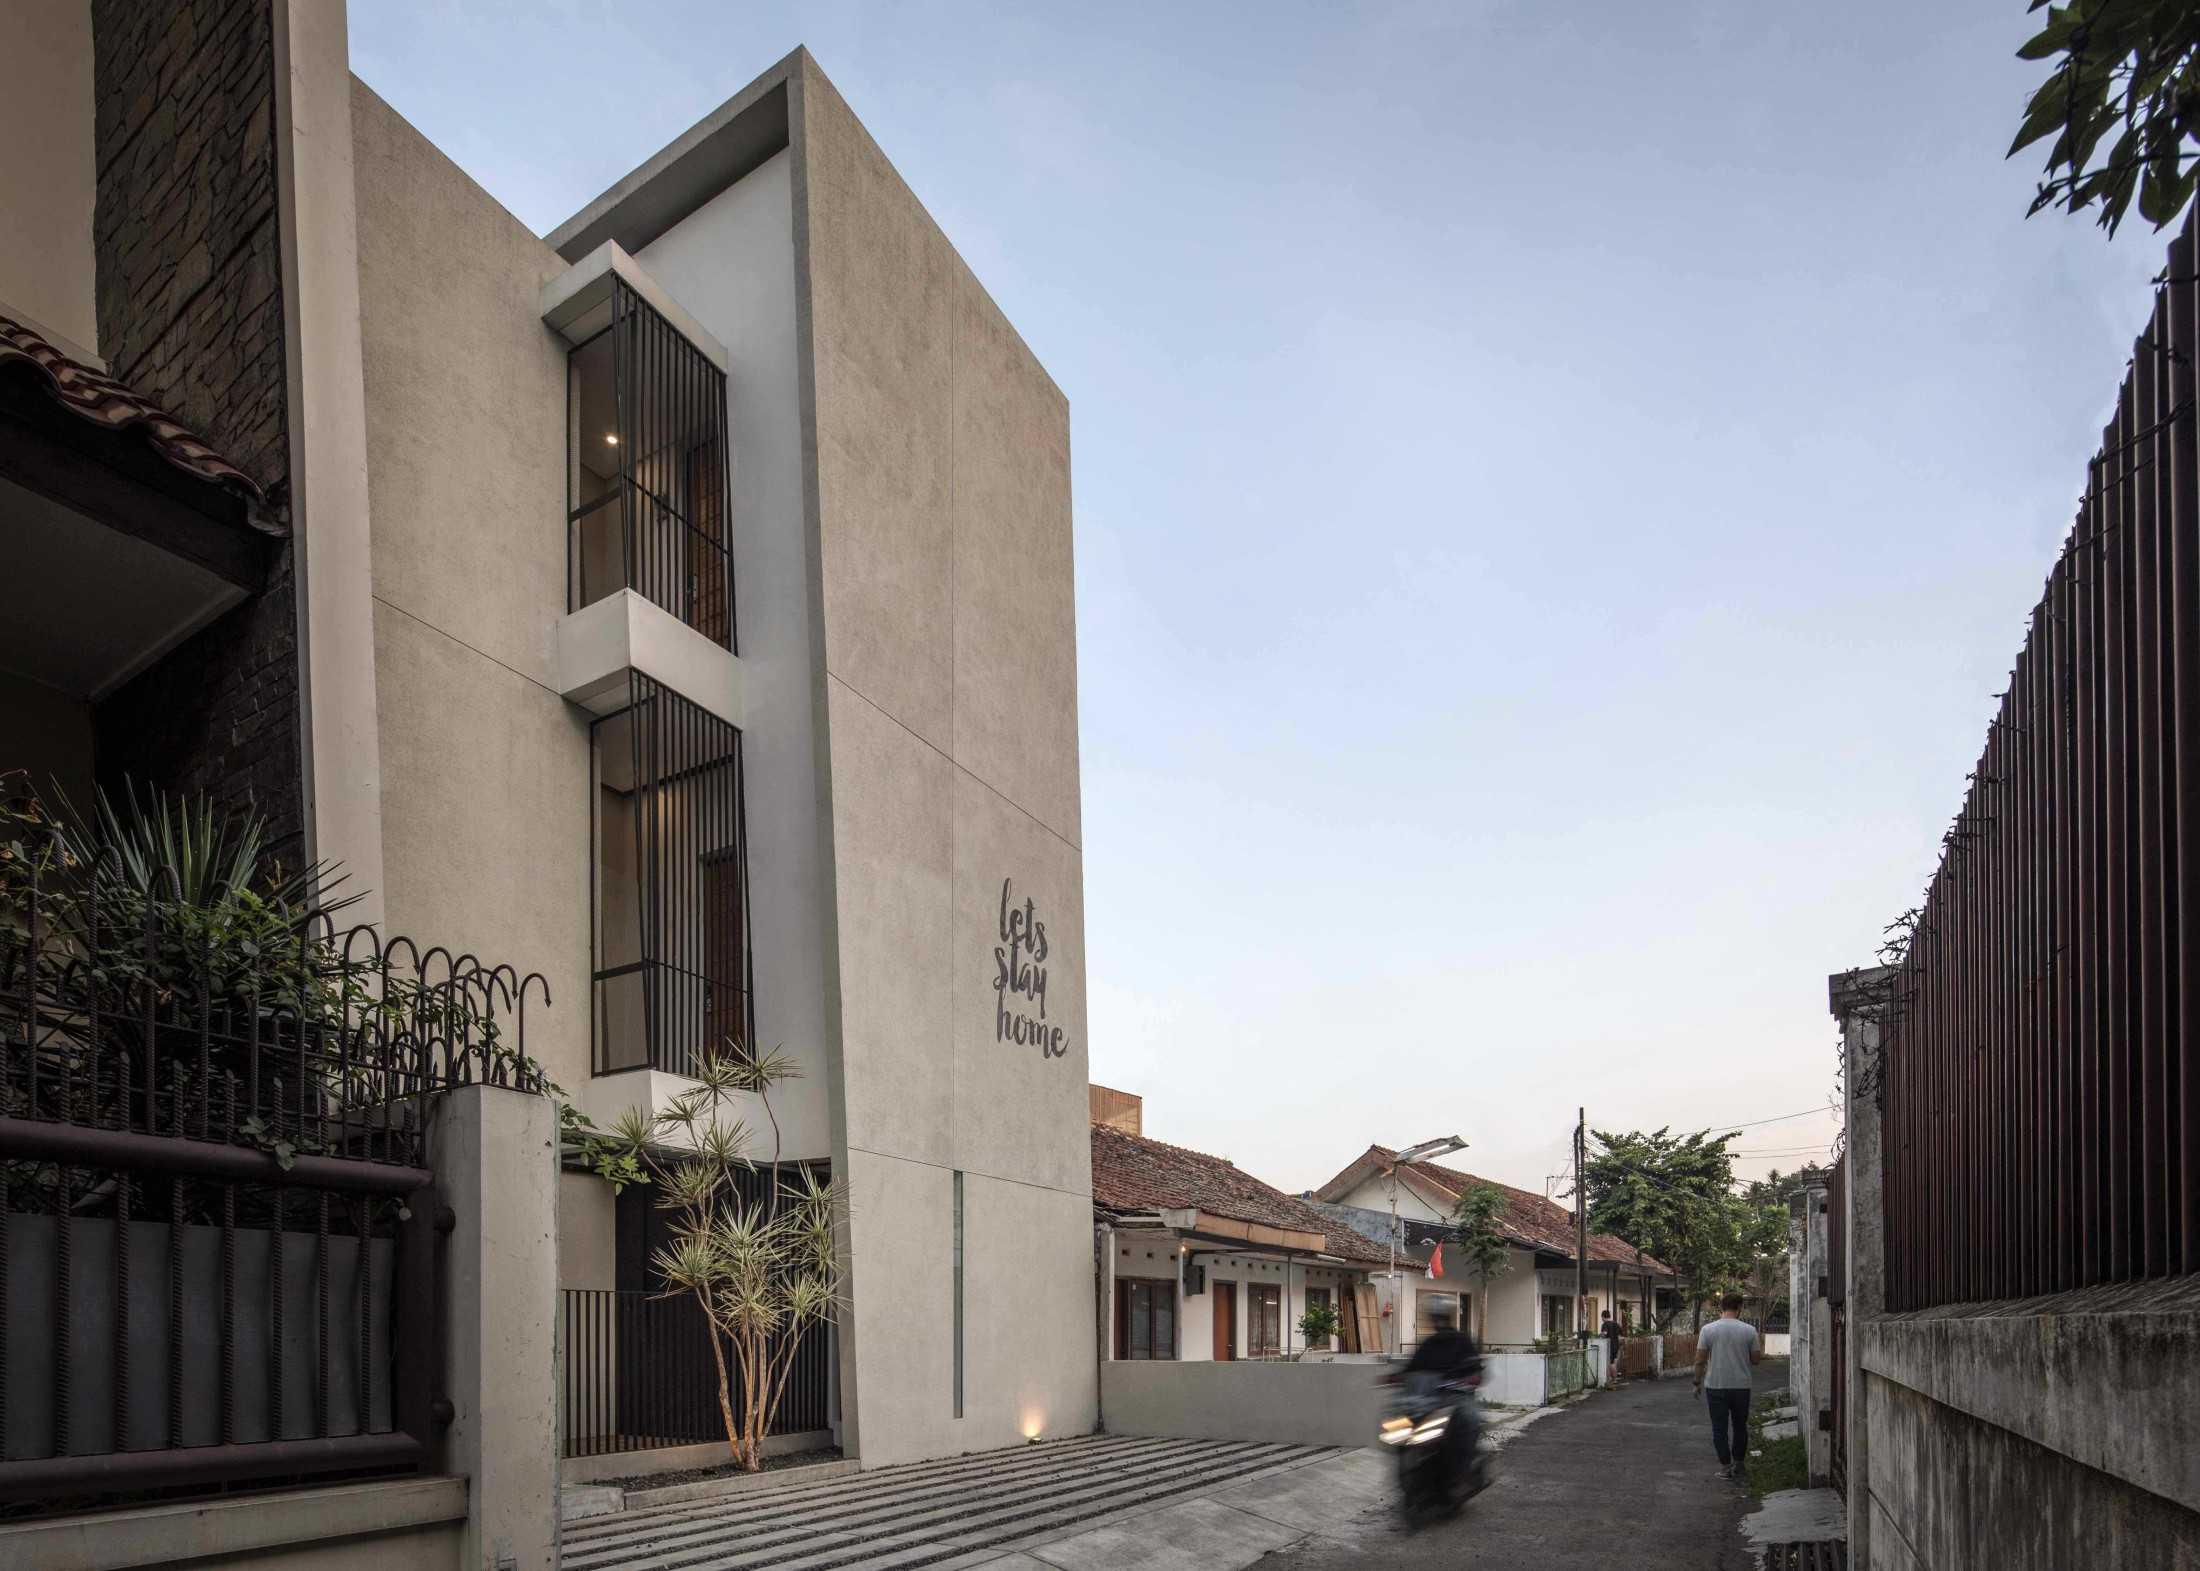 Rdma Lim Boarding House Pungkur, Kec. Regol, Kota Bandung, Jawa Barat, Indonesia Pungkur, Kec. Regol, Kota Bandung, Jawa Barat, Indonesia Rdma-Lim-Boarding-House  107678